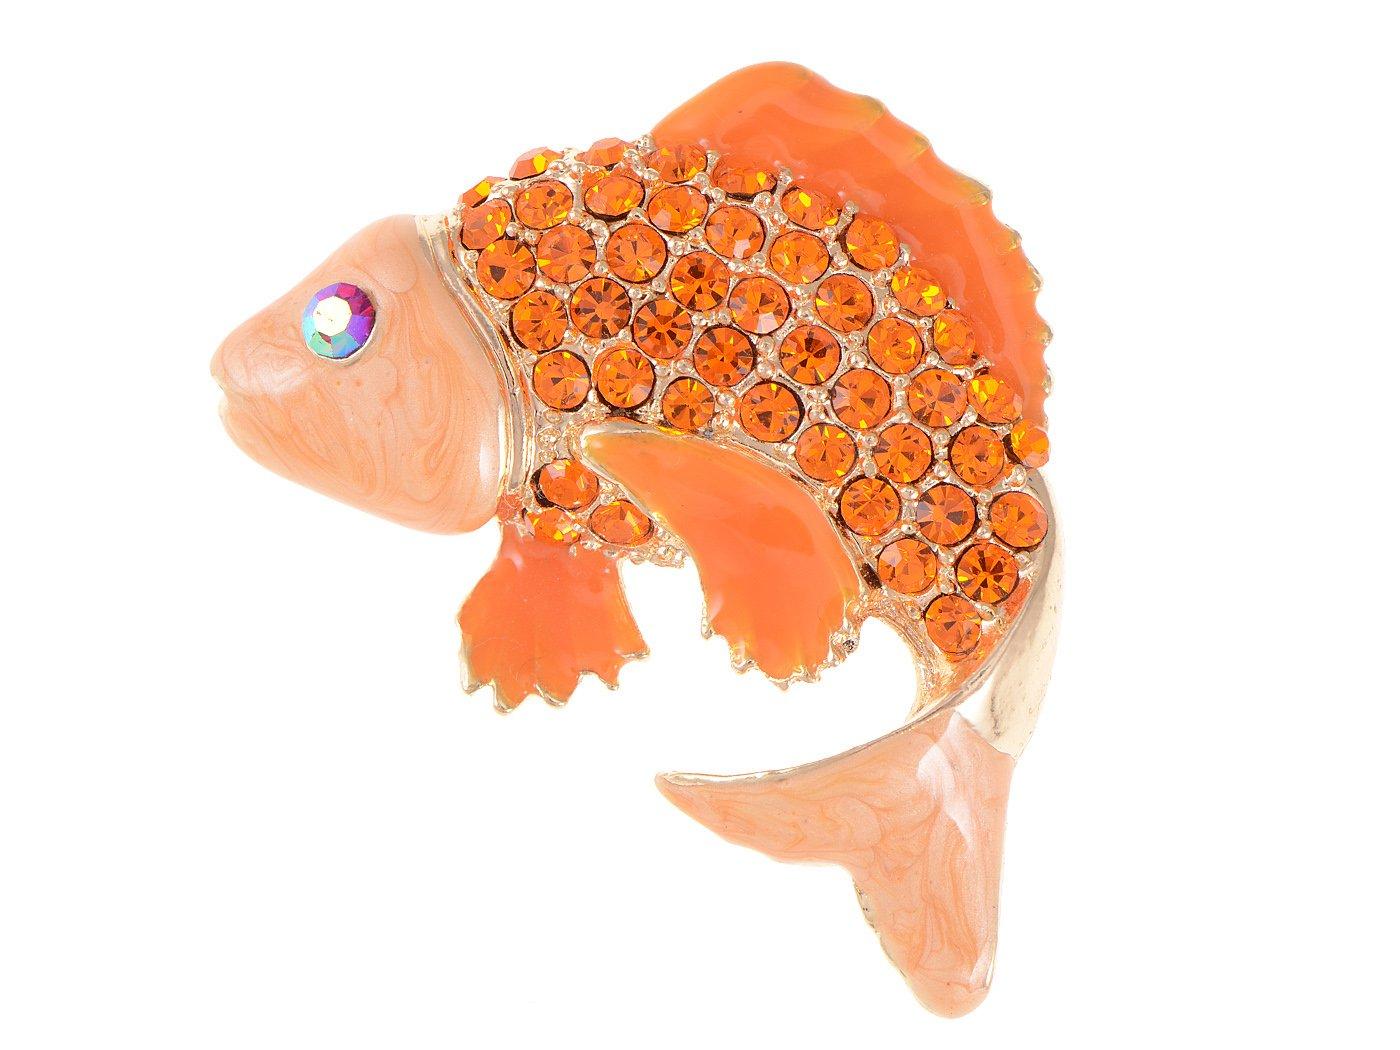 Alilang Lucky Love Koi Gold Fish Carp Golden Tone Enamel Orange Crystal Rhinestone Animal Pin Brooch